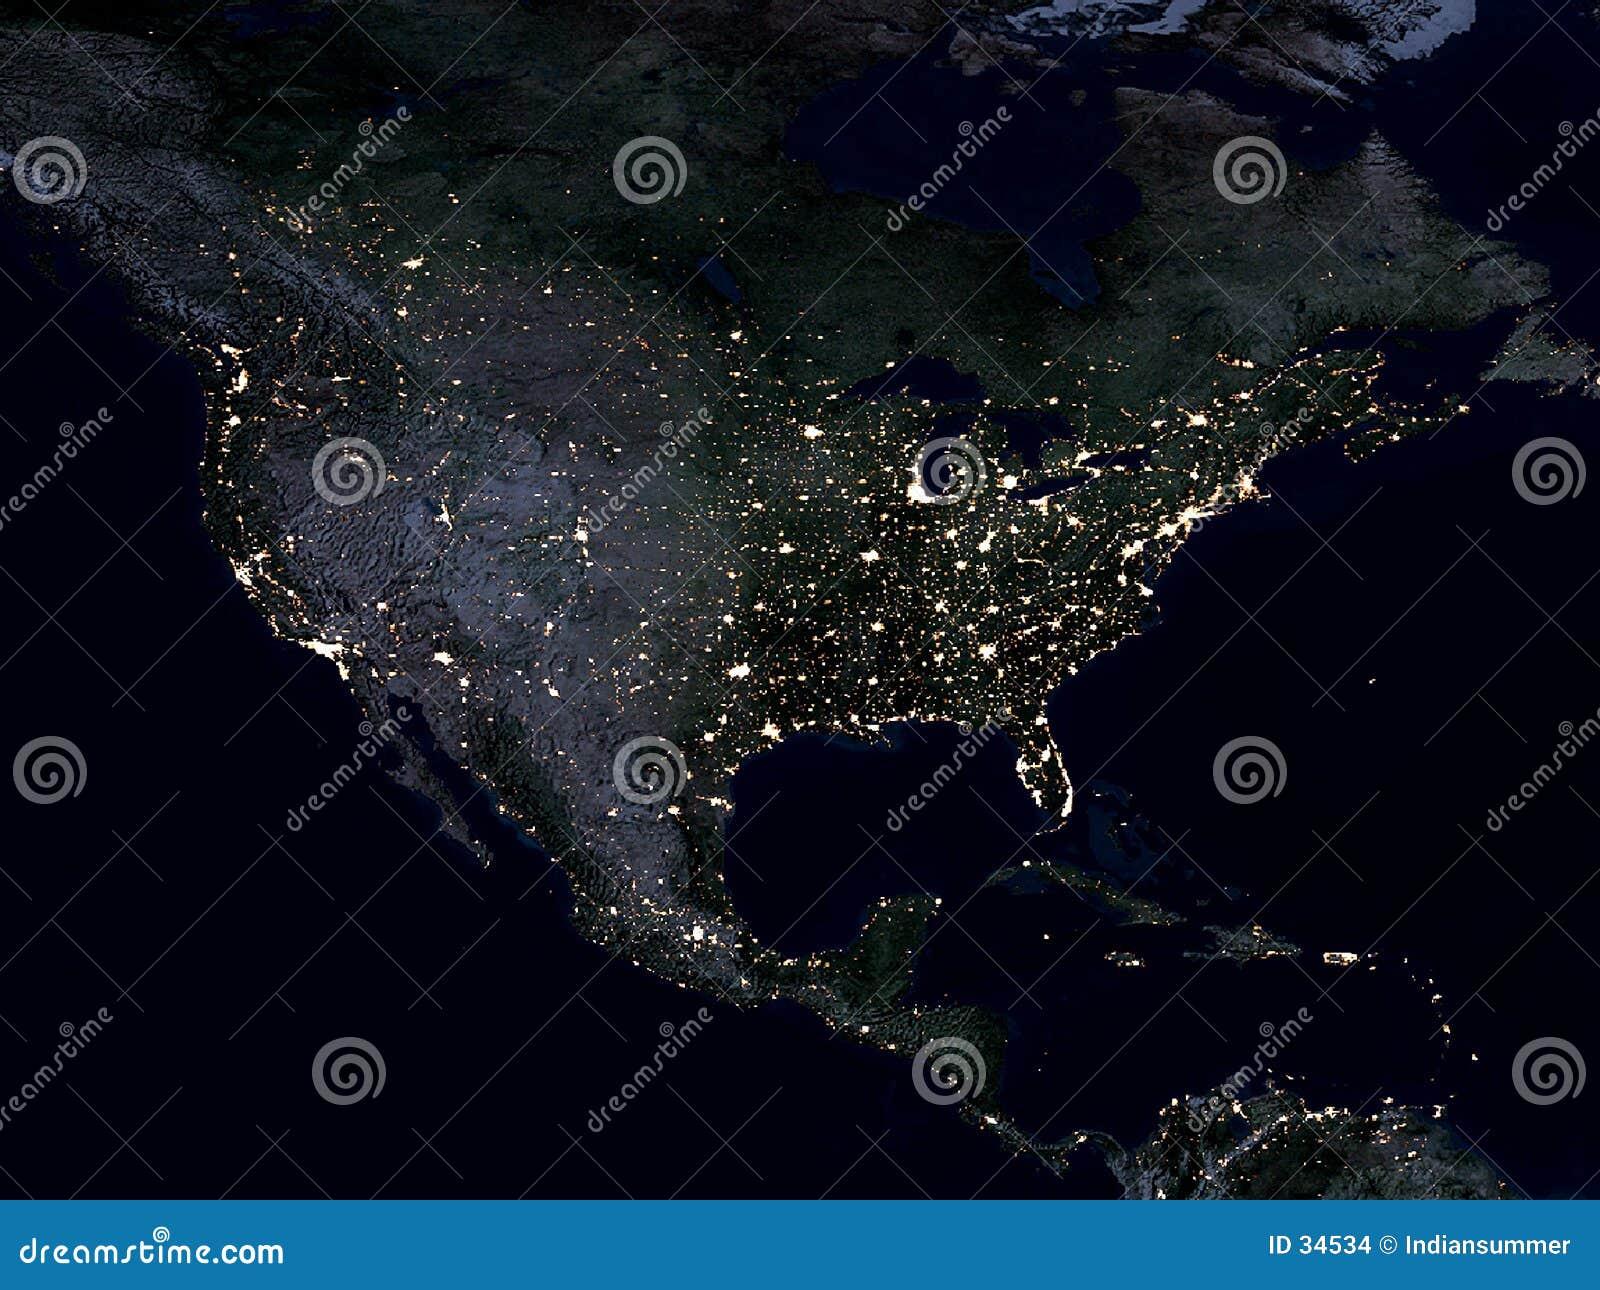 Earth map, North America, night